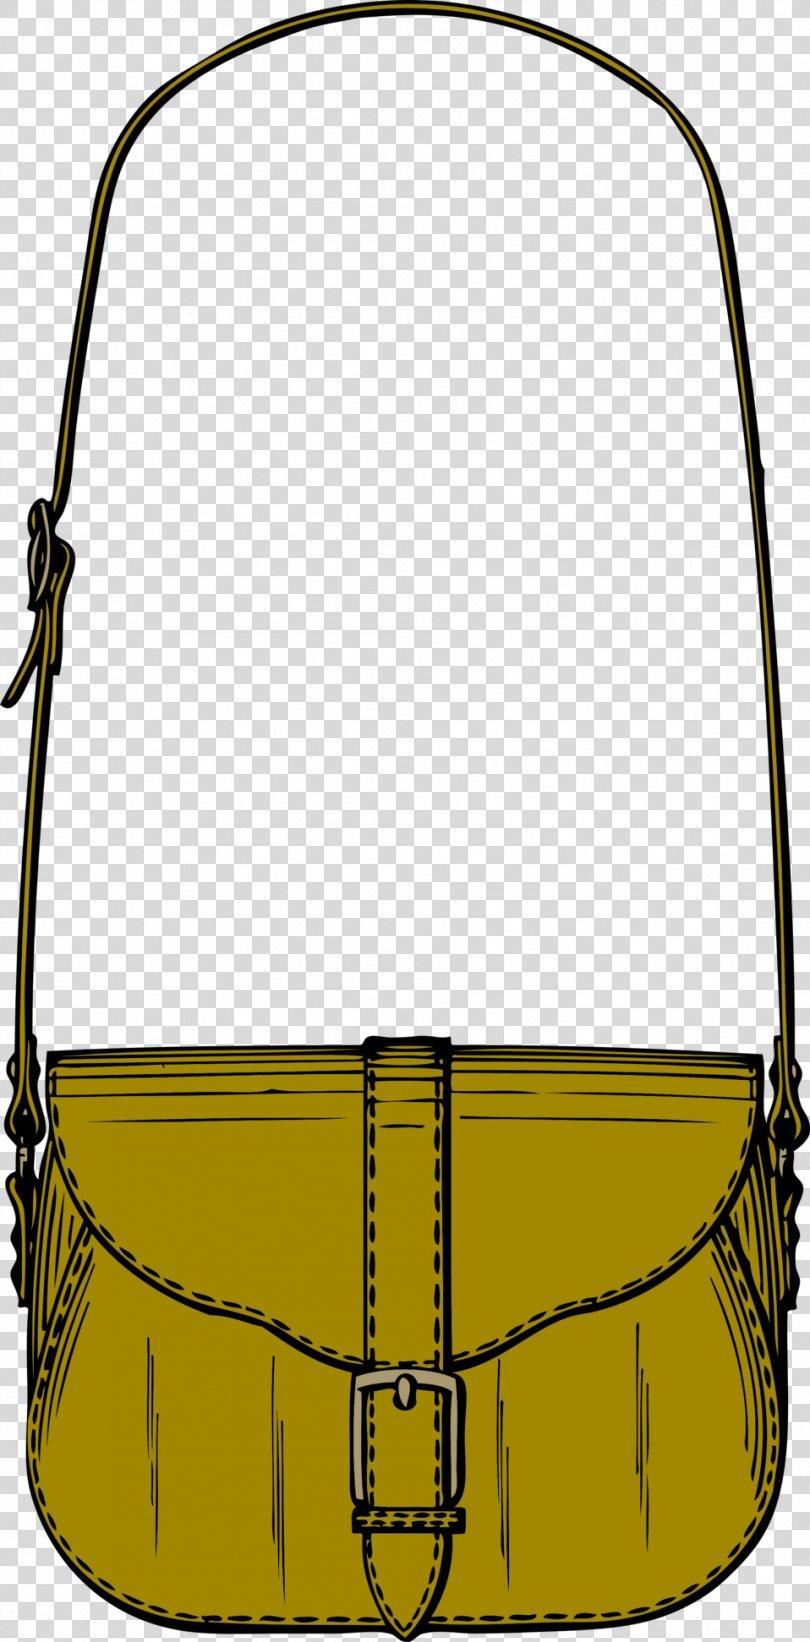 Handbag Coin Purse Clip Art, Purse PNG